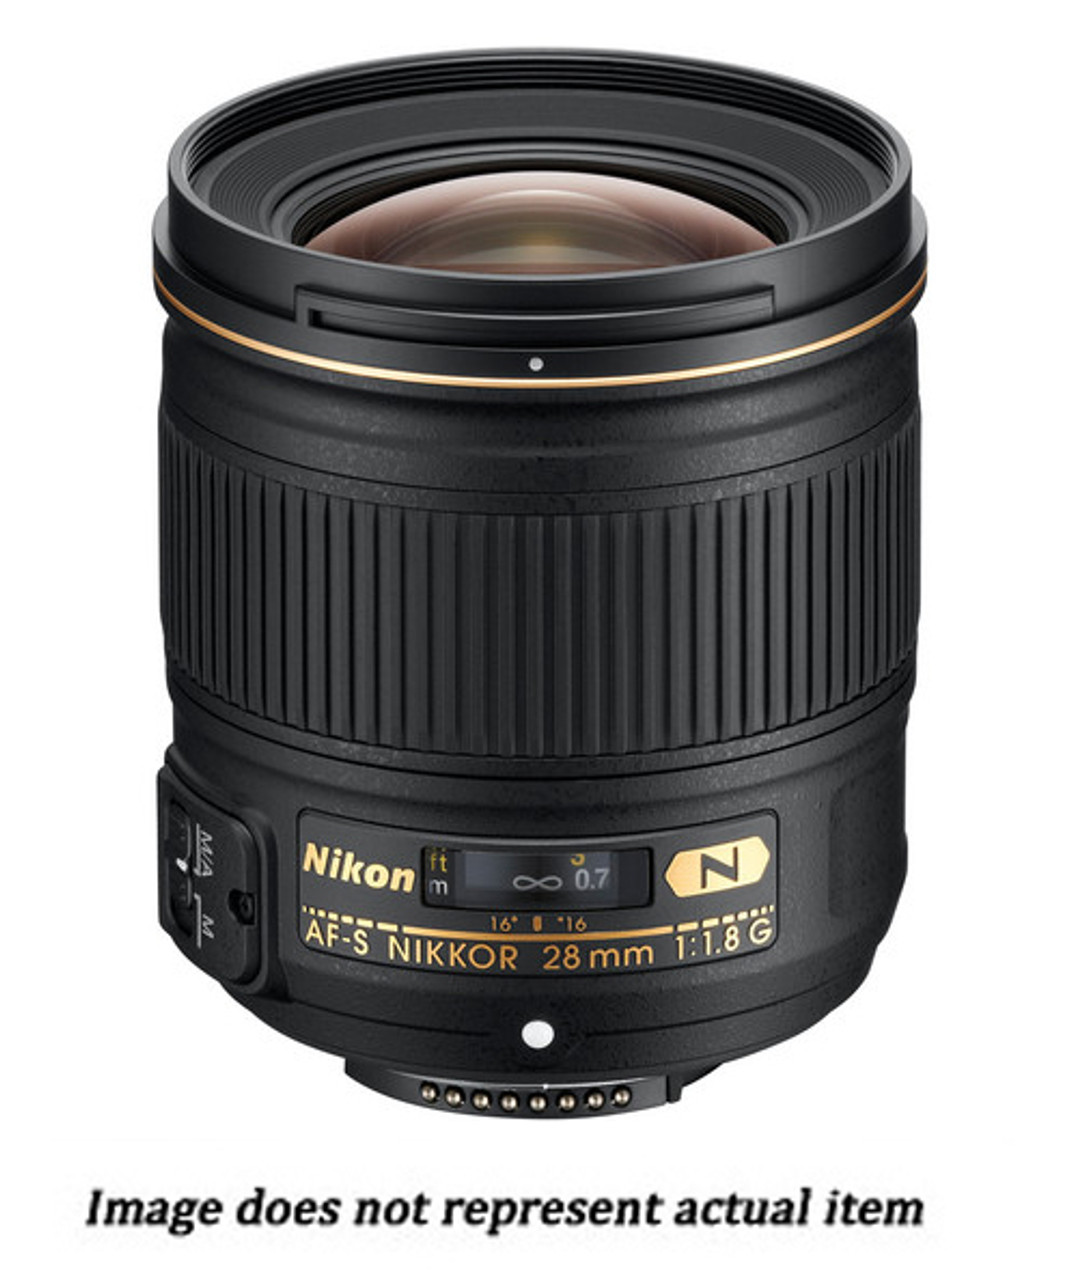 Nikon AF-S 28mm f/1.8G (USED) - S/N 235561